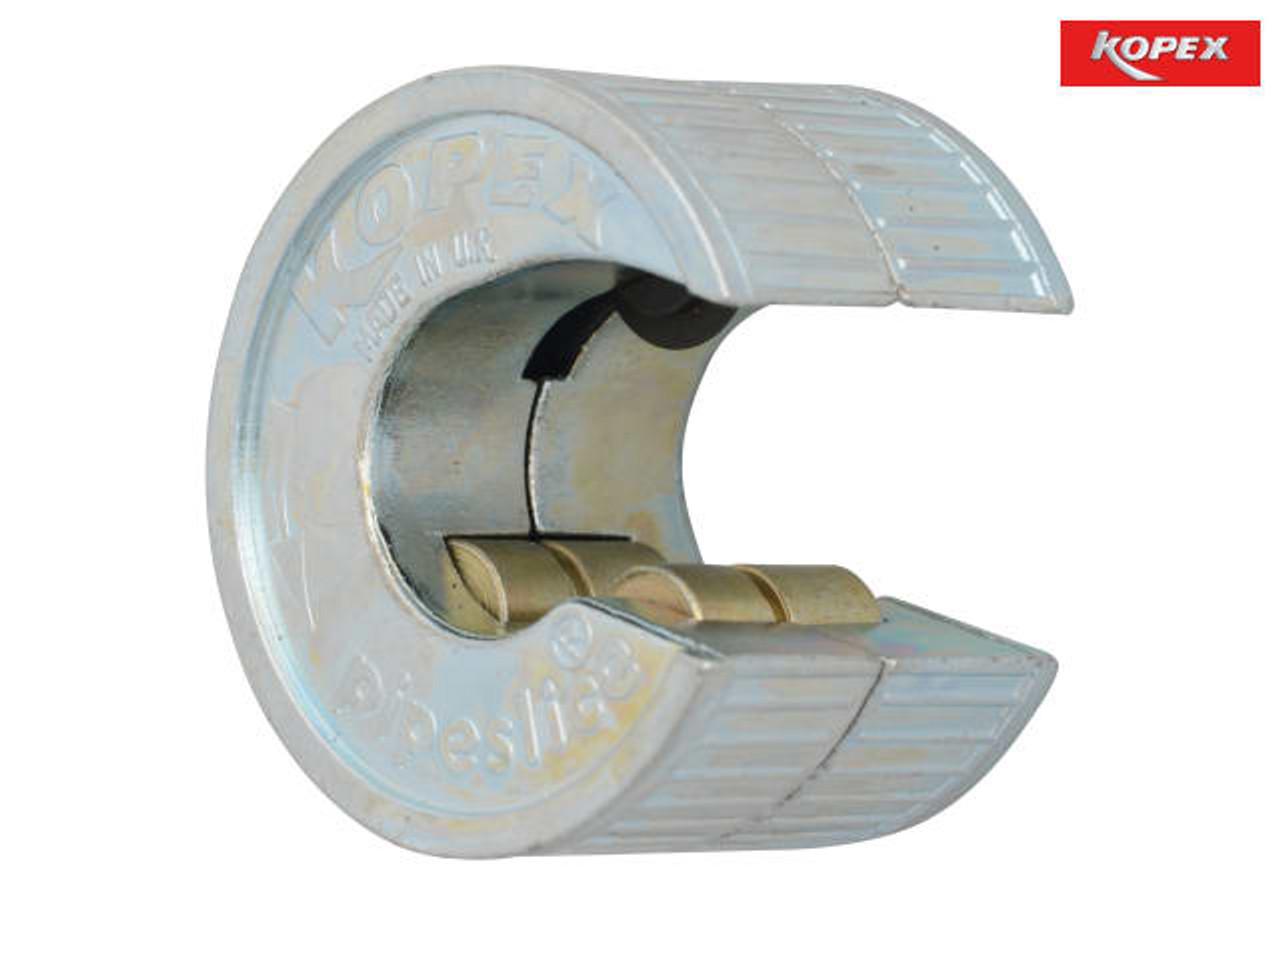 Kopex TPPS15 Pipe-Prep 15mm KOPTPPS15